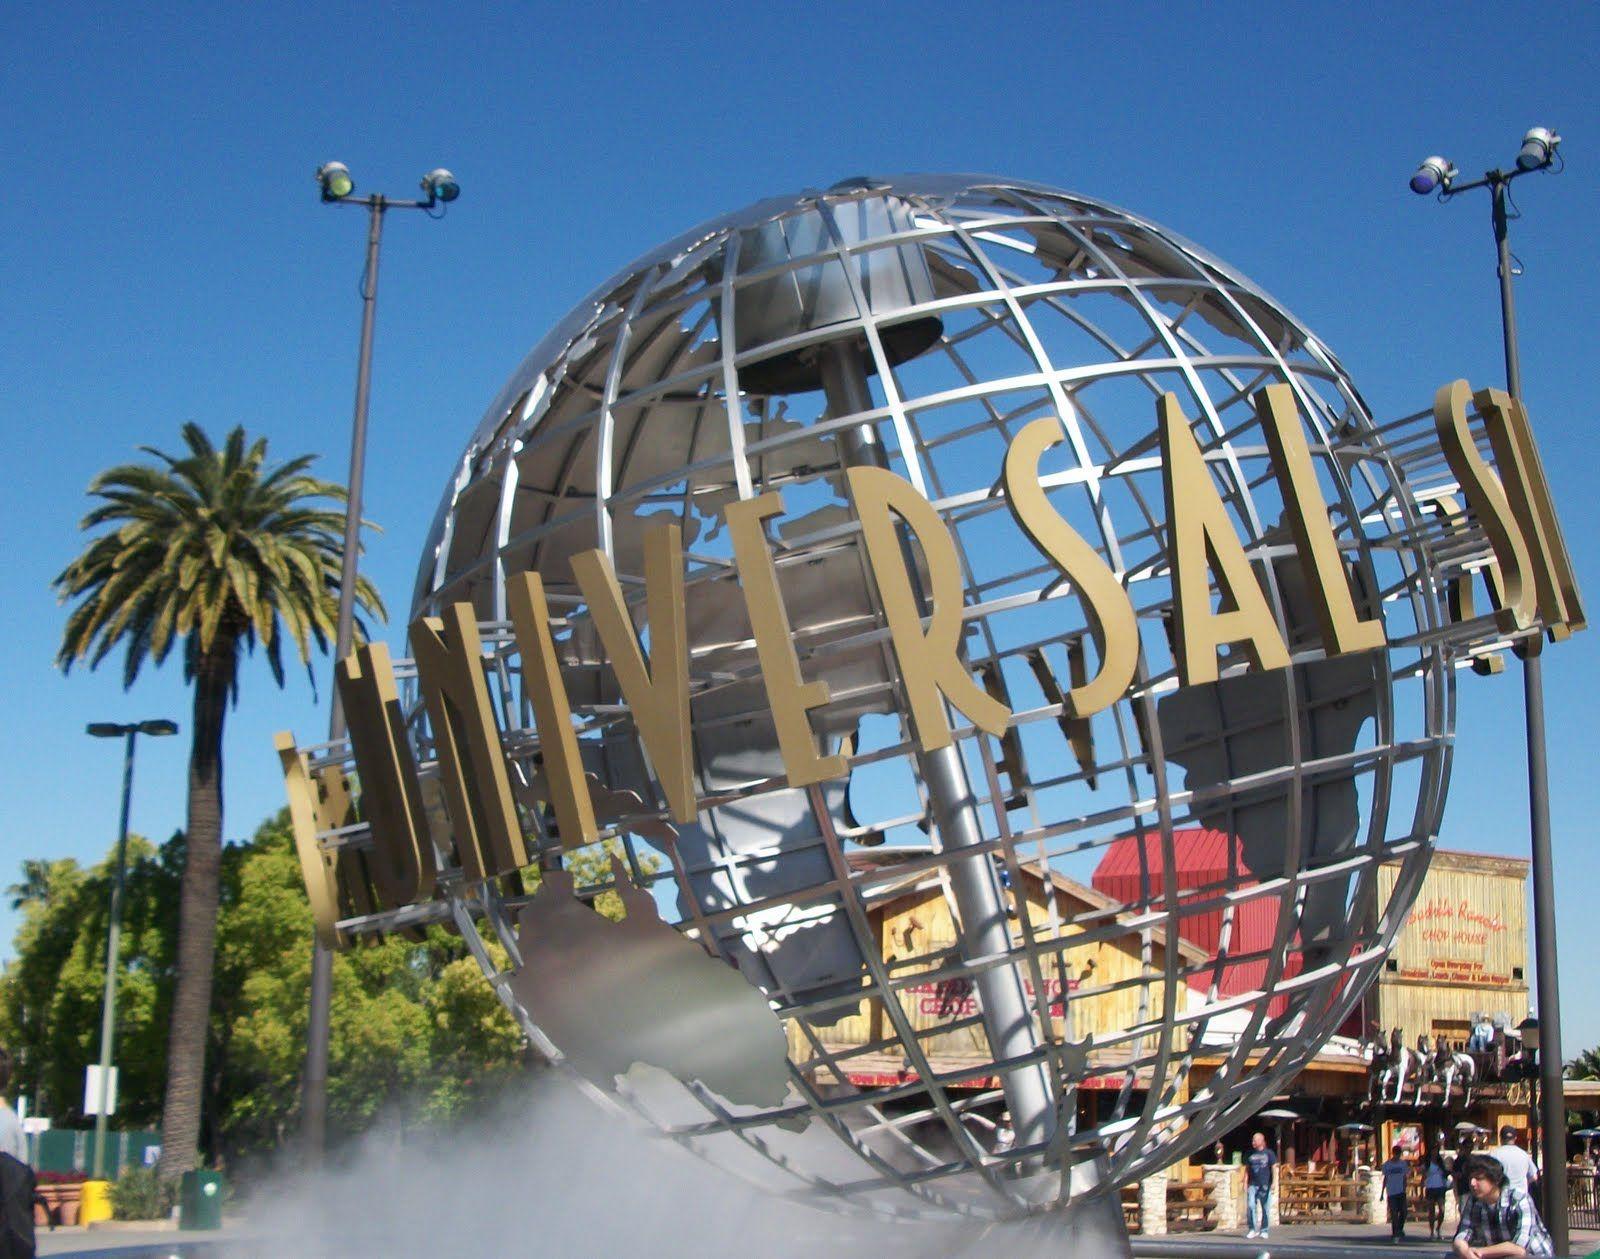 Universal Studios Universal Studio Los Angeles Los Angeles San Diego California Vacation